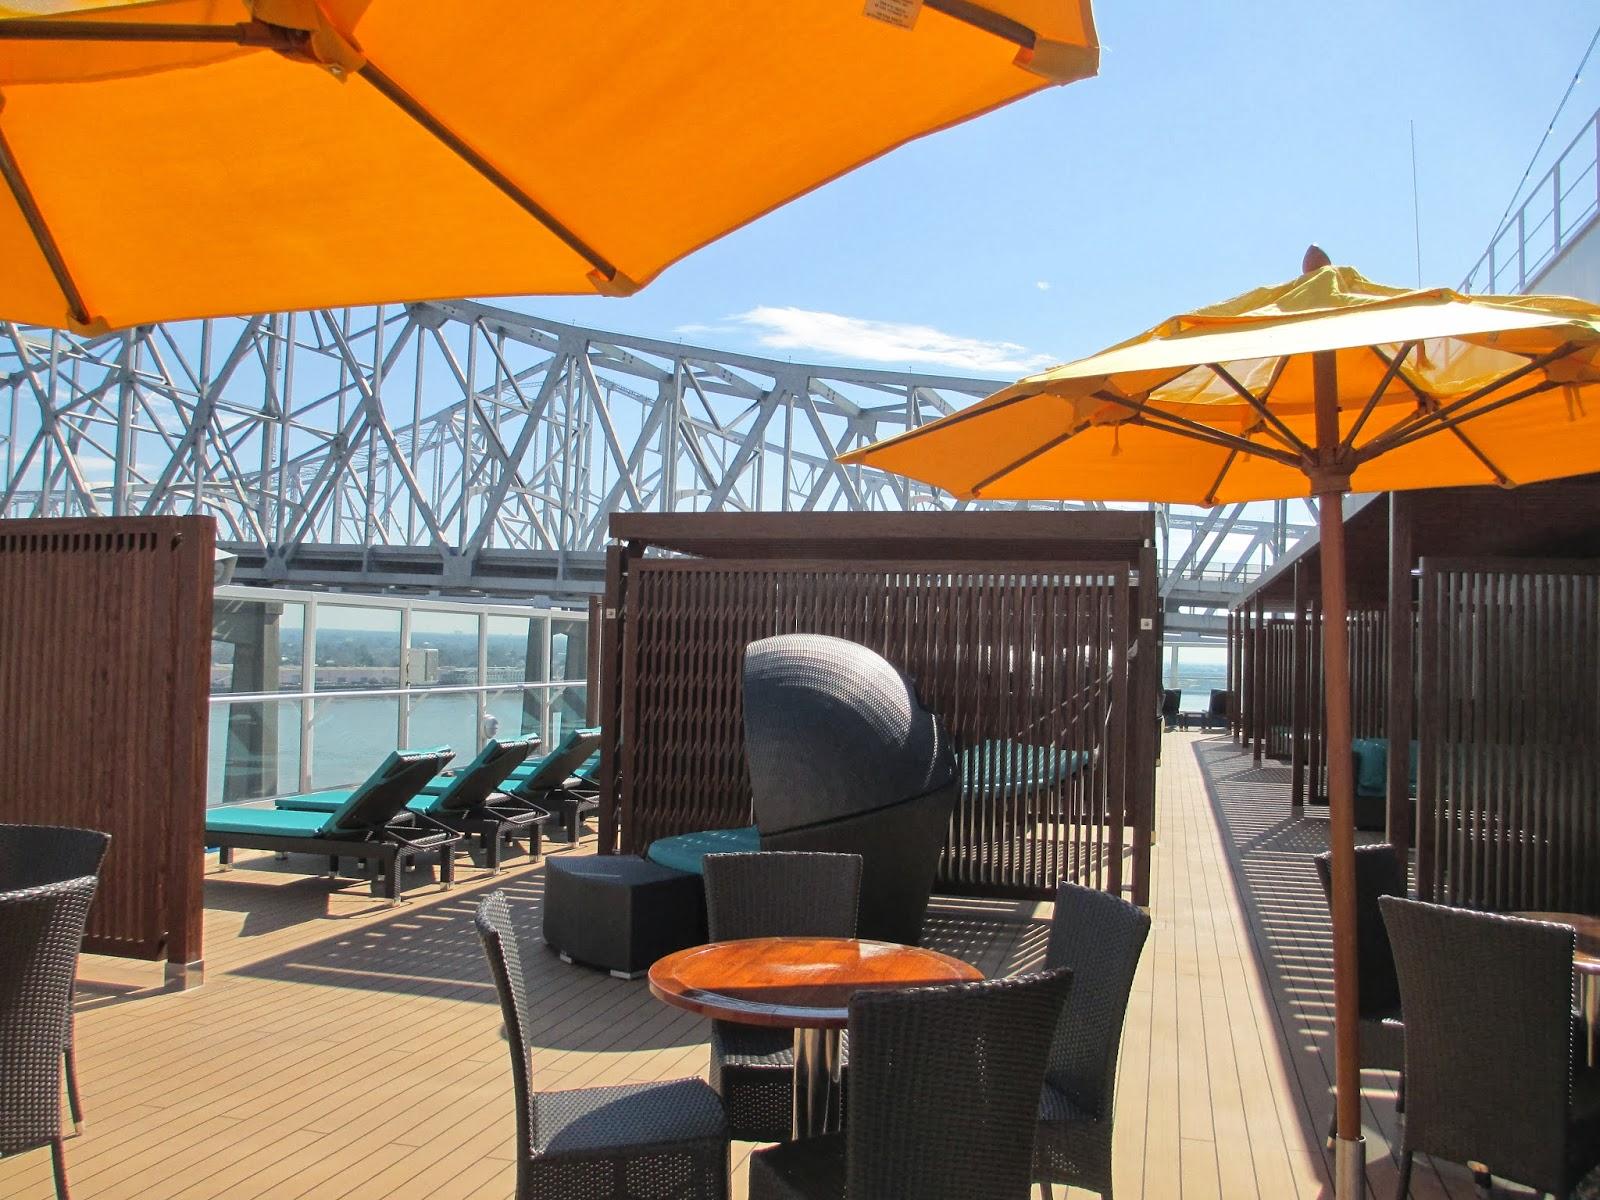 Travel Reviews Amp Information Carnival Sunshine Cruise 7